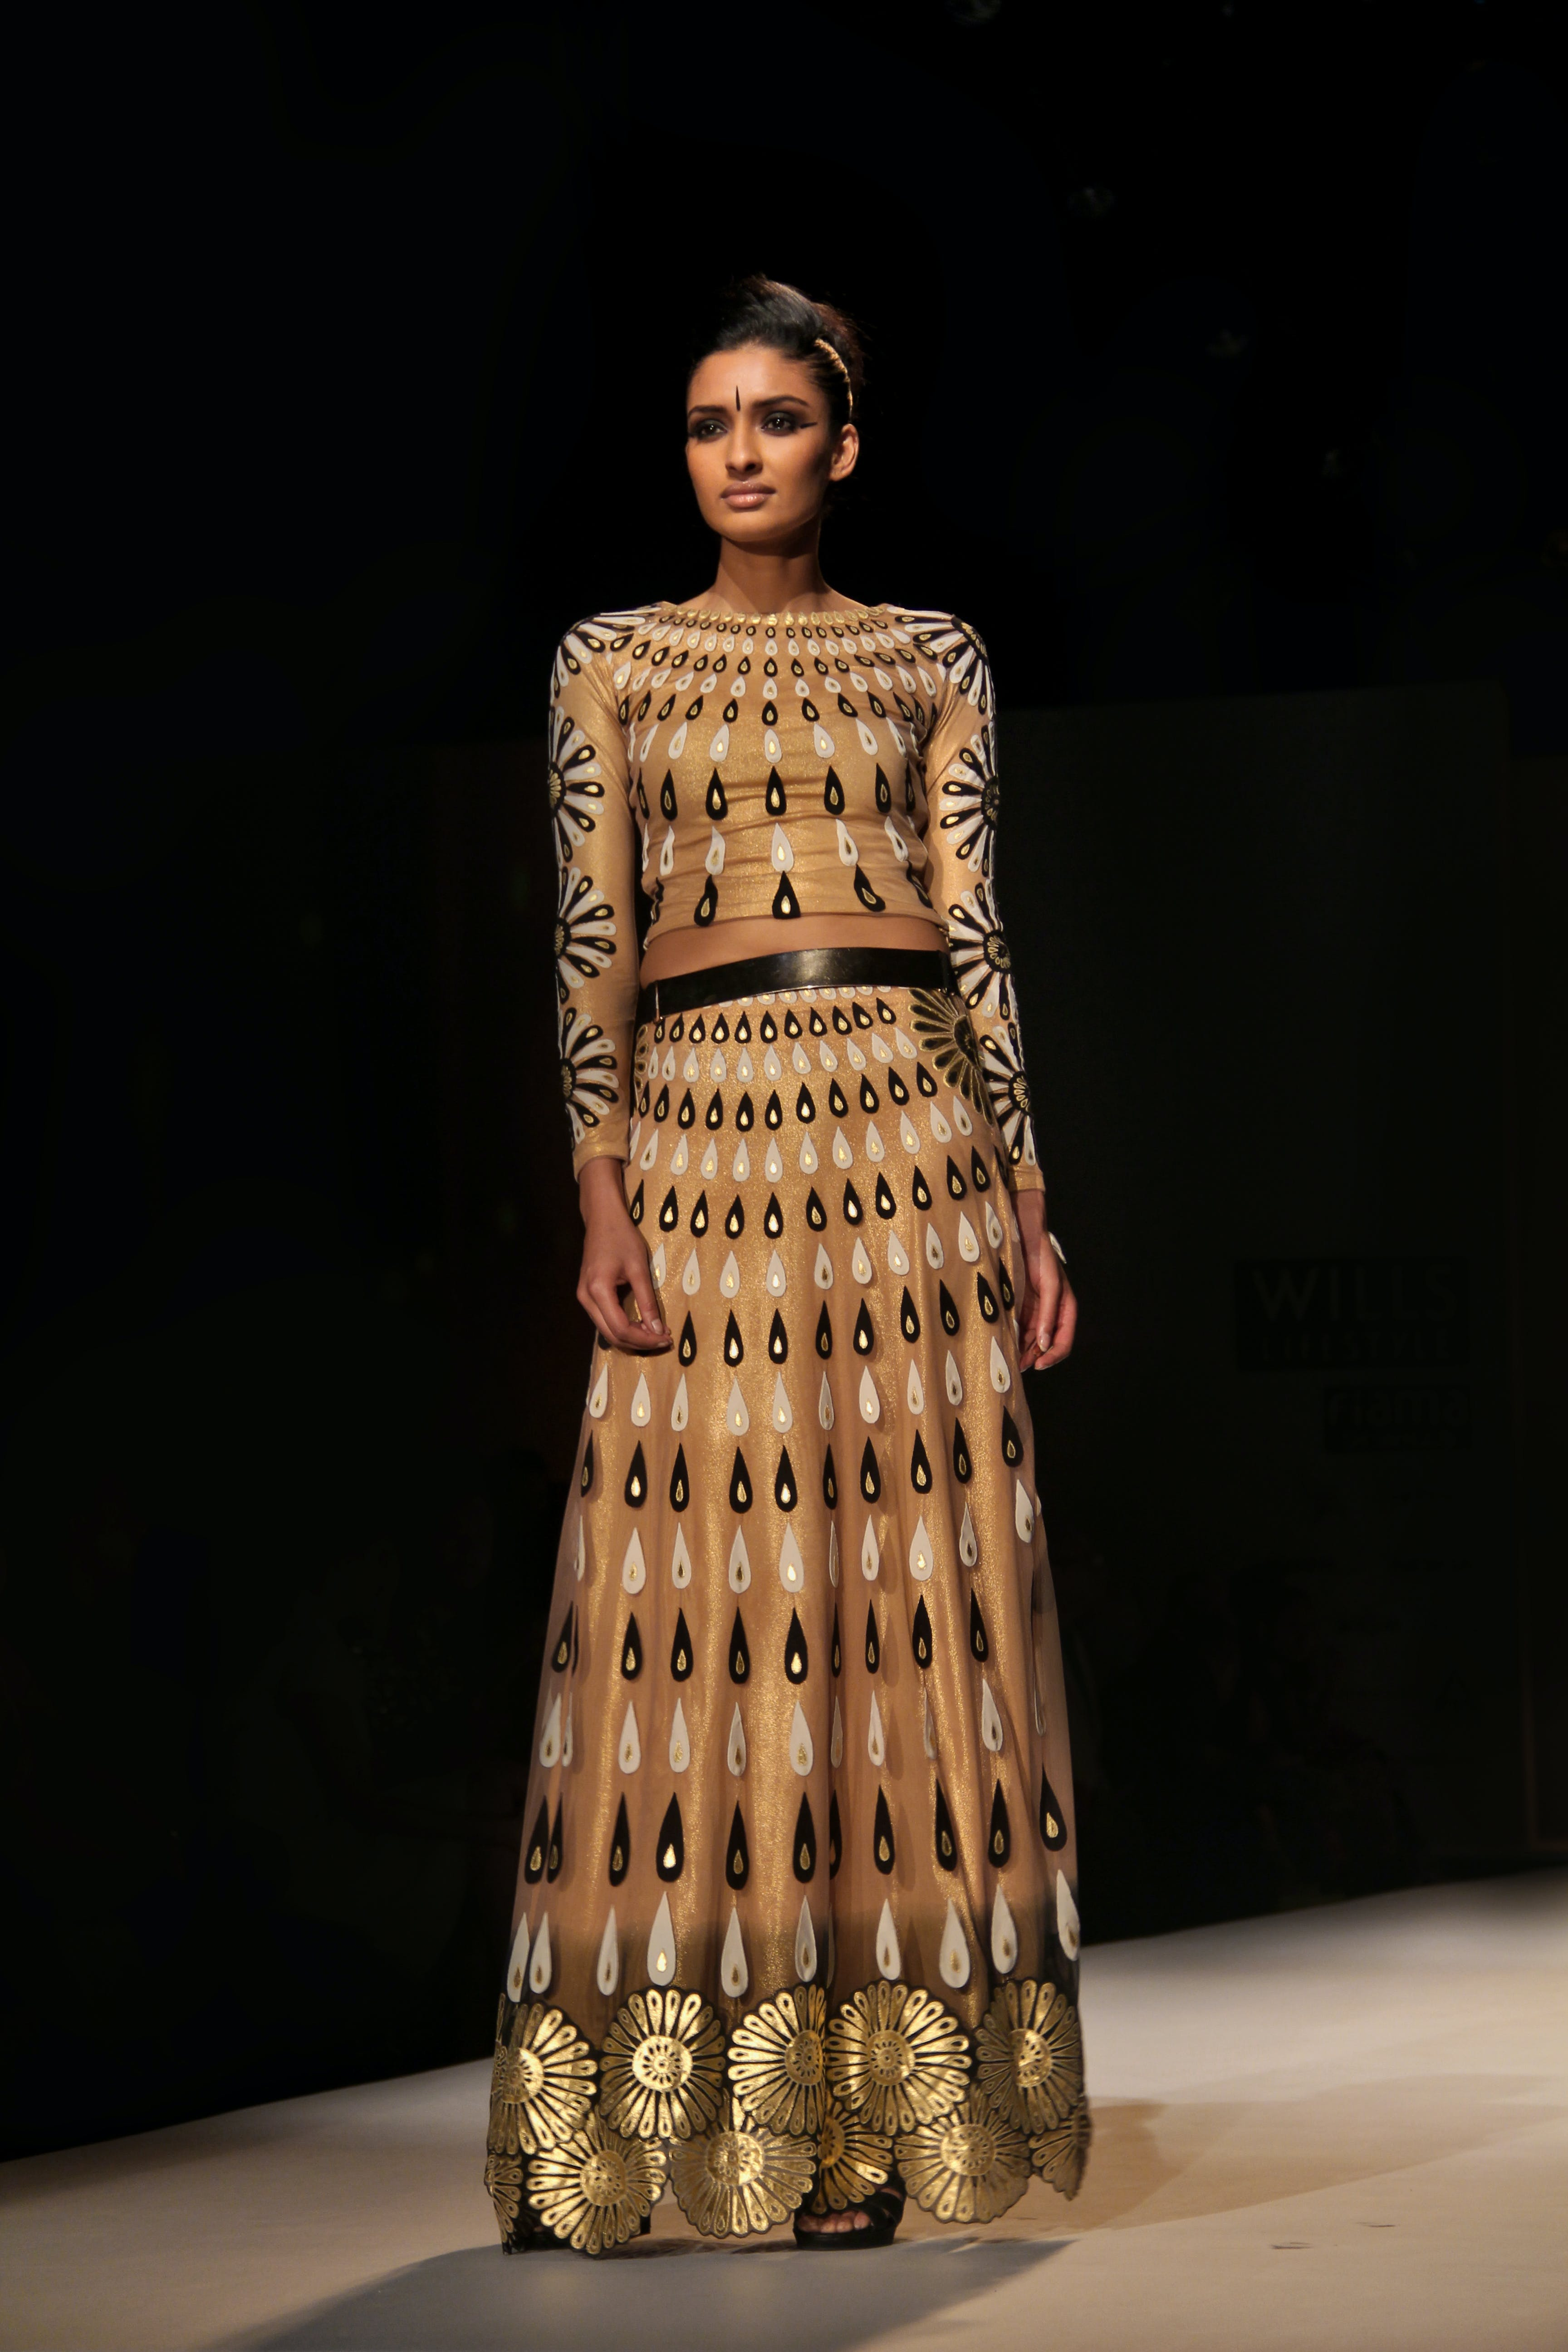 Kostenloses Stock Foto zu delhi, elegant, erwachsener, fashion